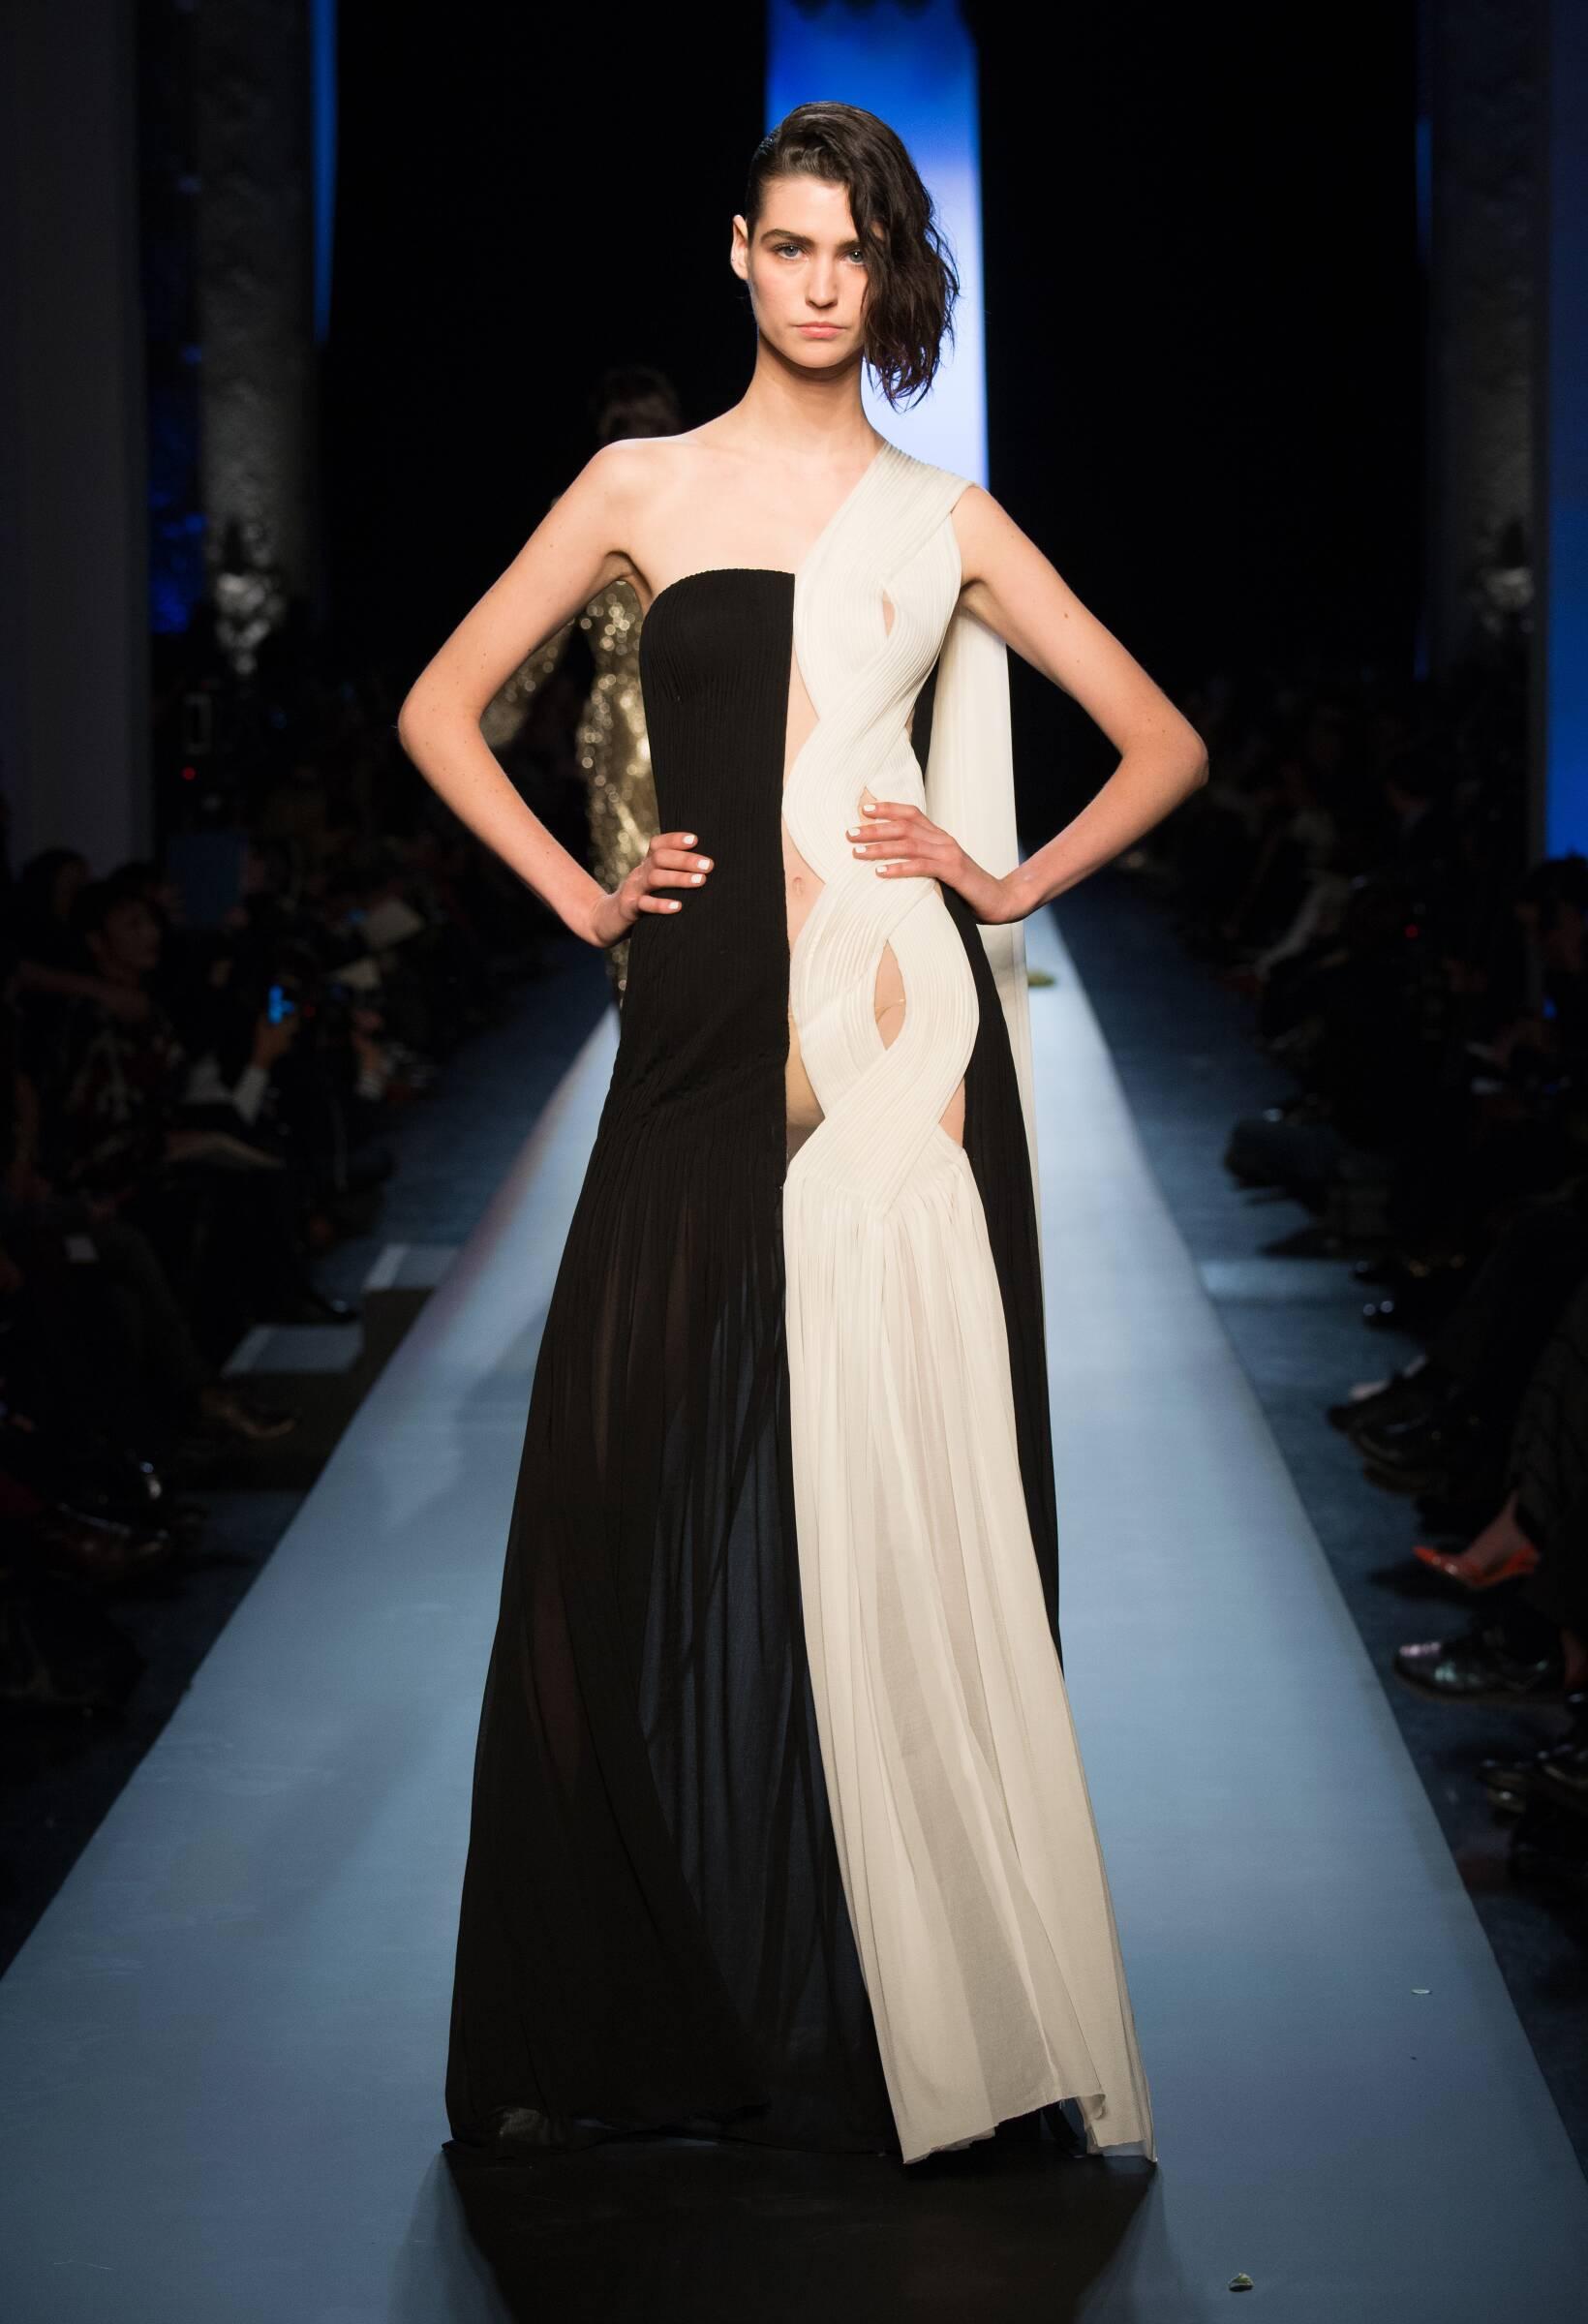 Catwalk 2015 Jean Paul Gaultier Haute Couture Collection Fashion Show Summer